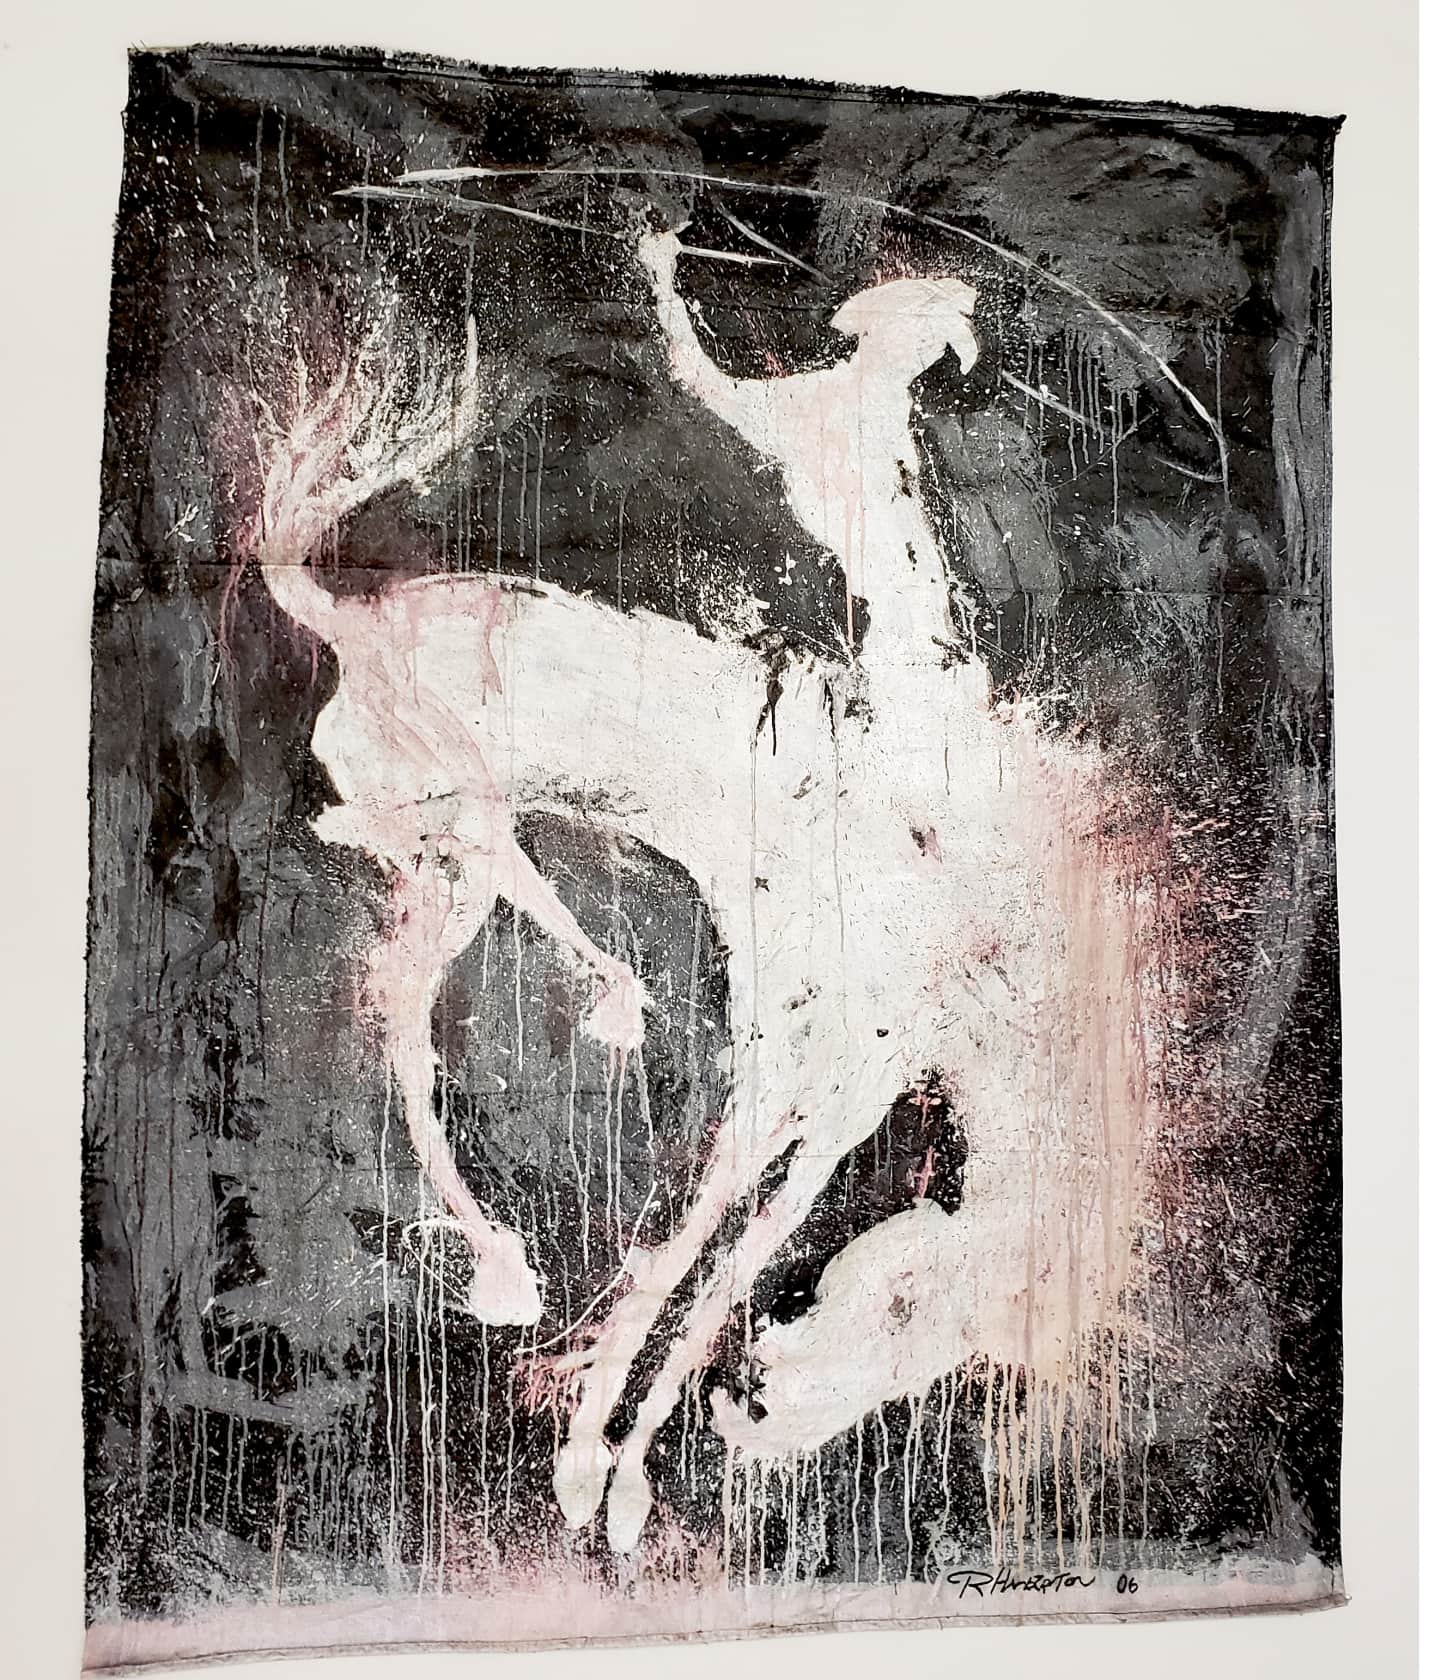 Richard Hambleton Horse & Rider Acrylic on Canvas